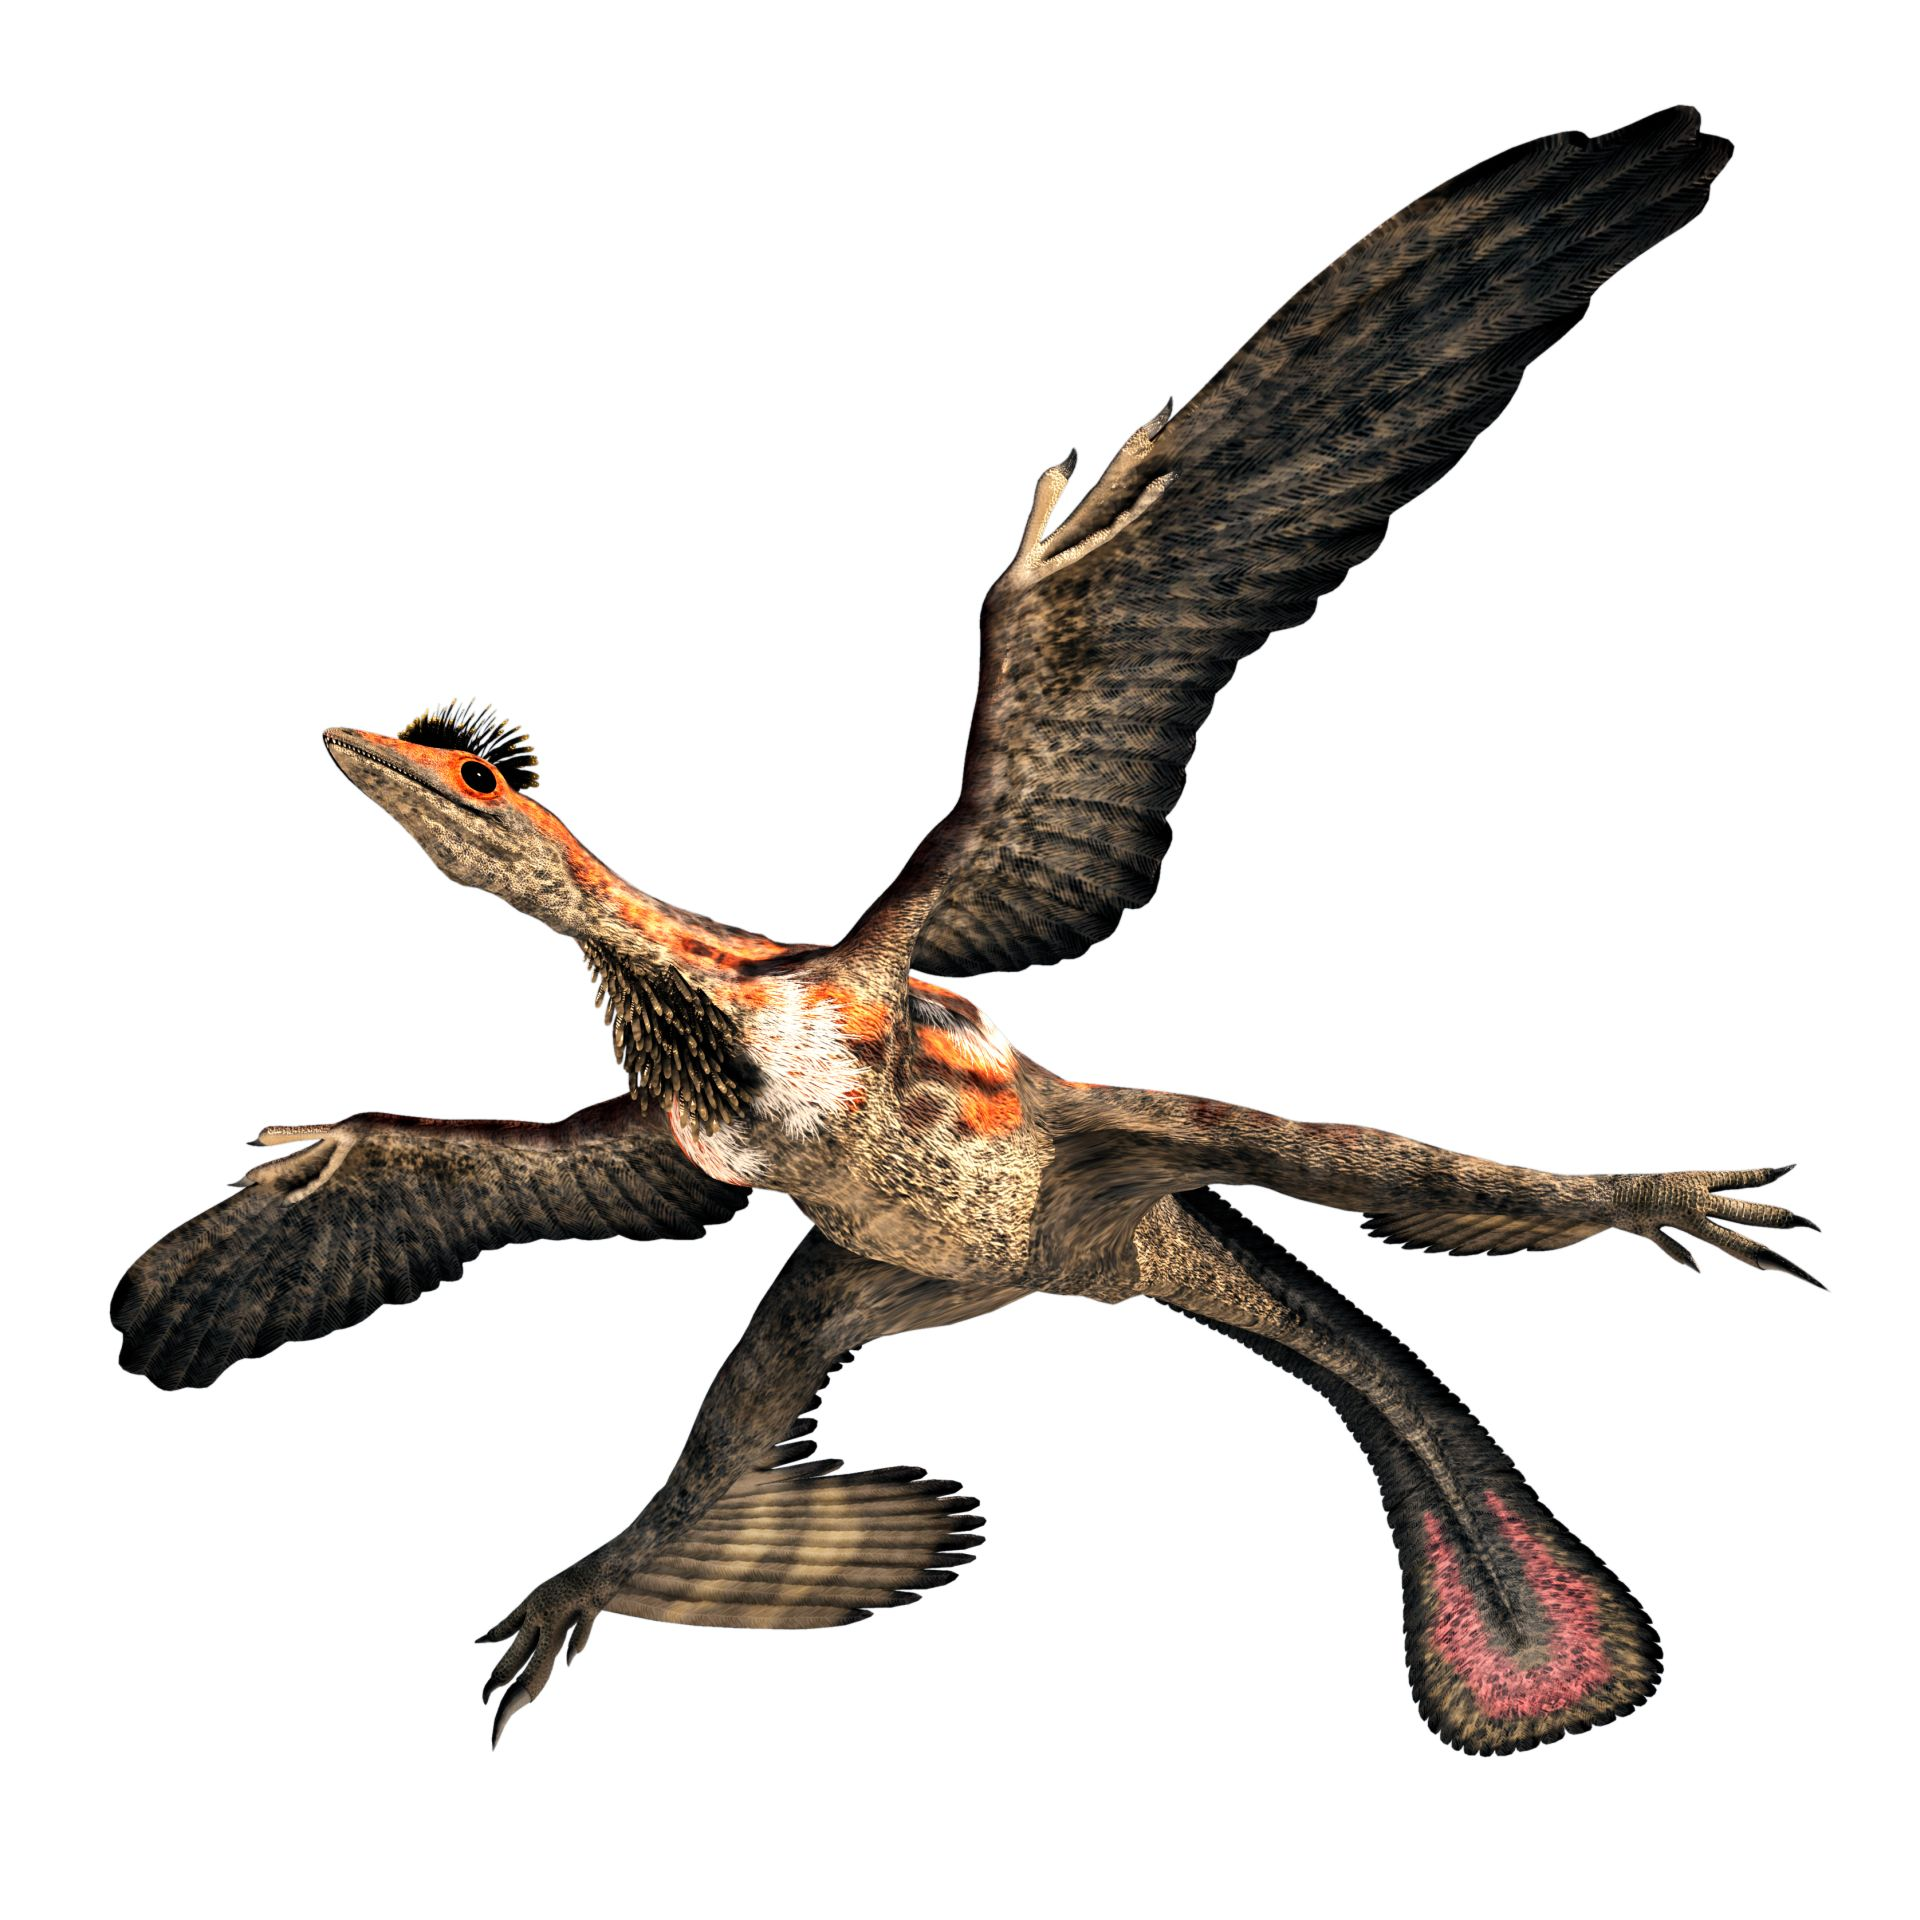 Microraptor Dinosaur For Kids Dk Find Out